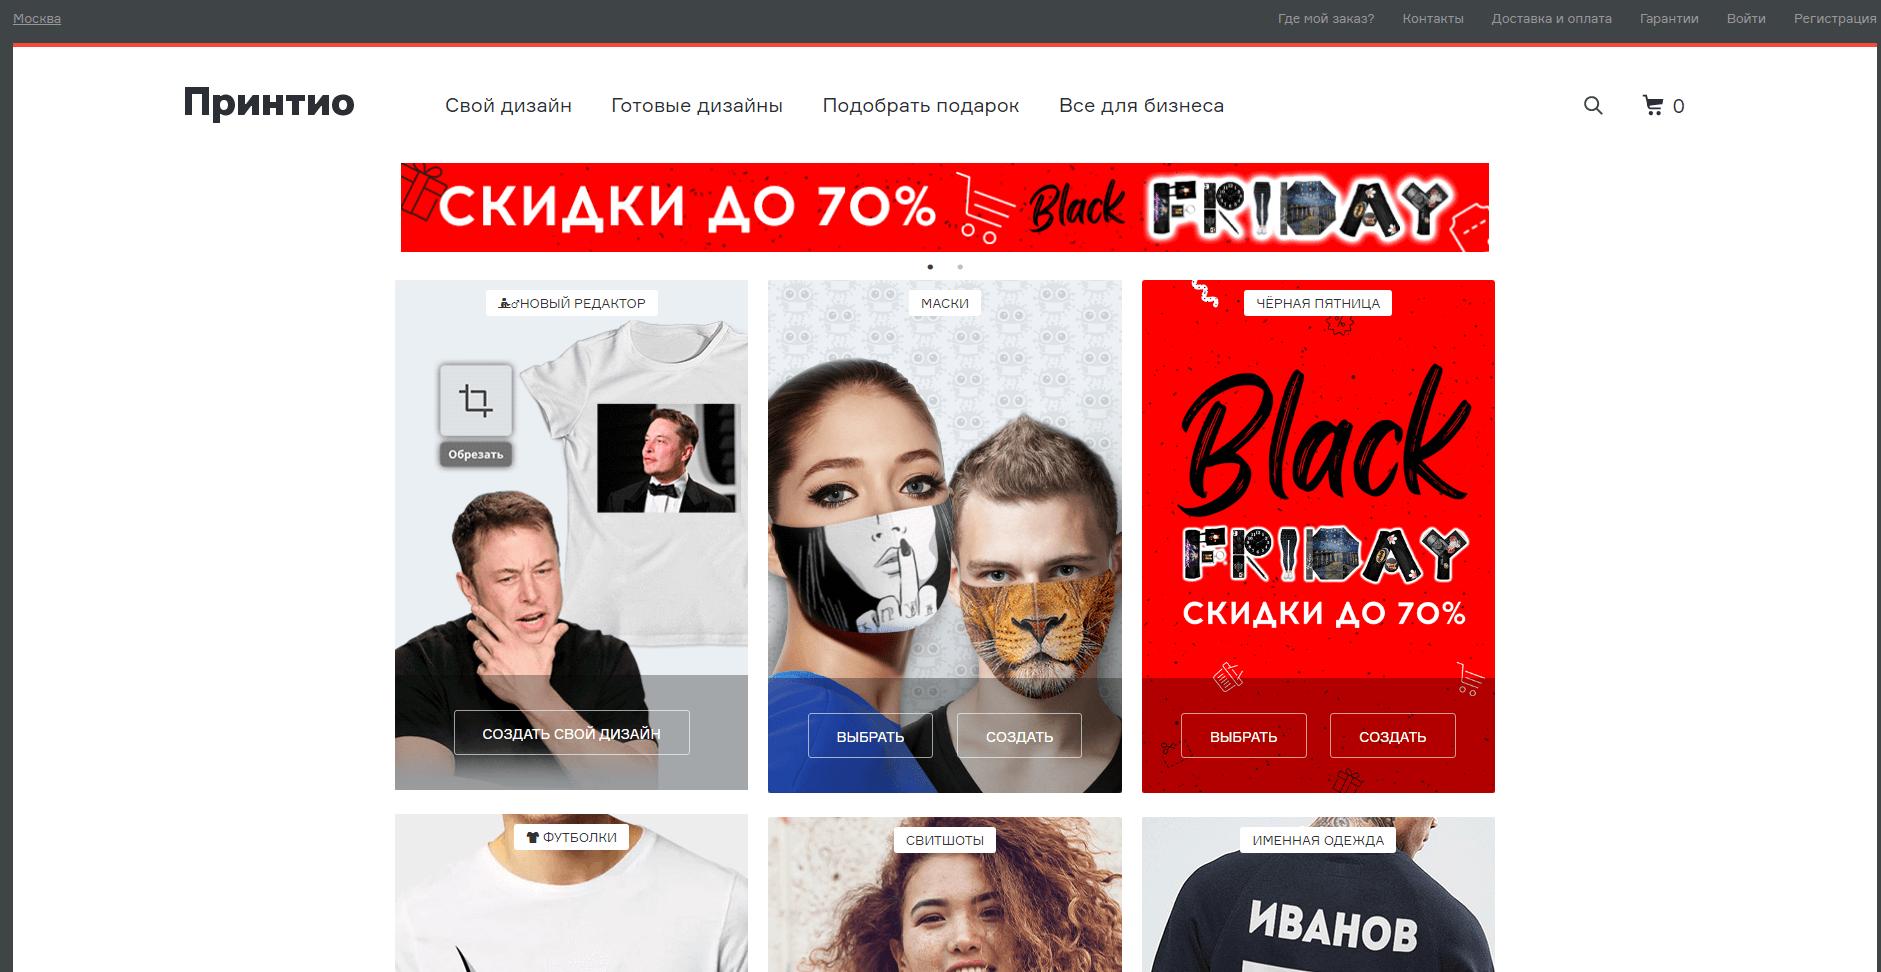 printio.ru website